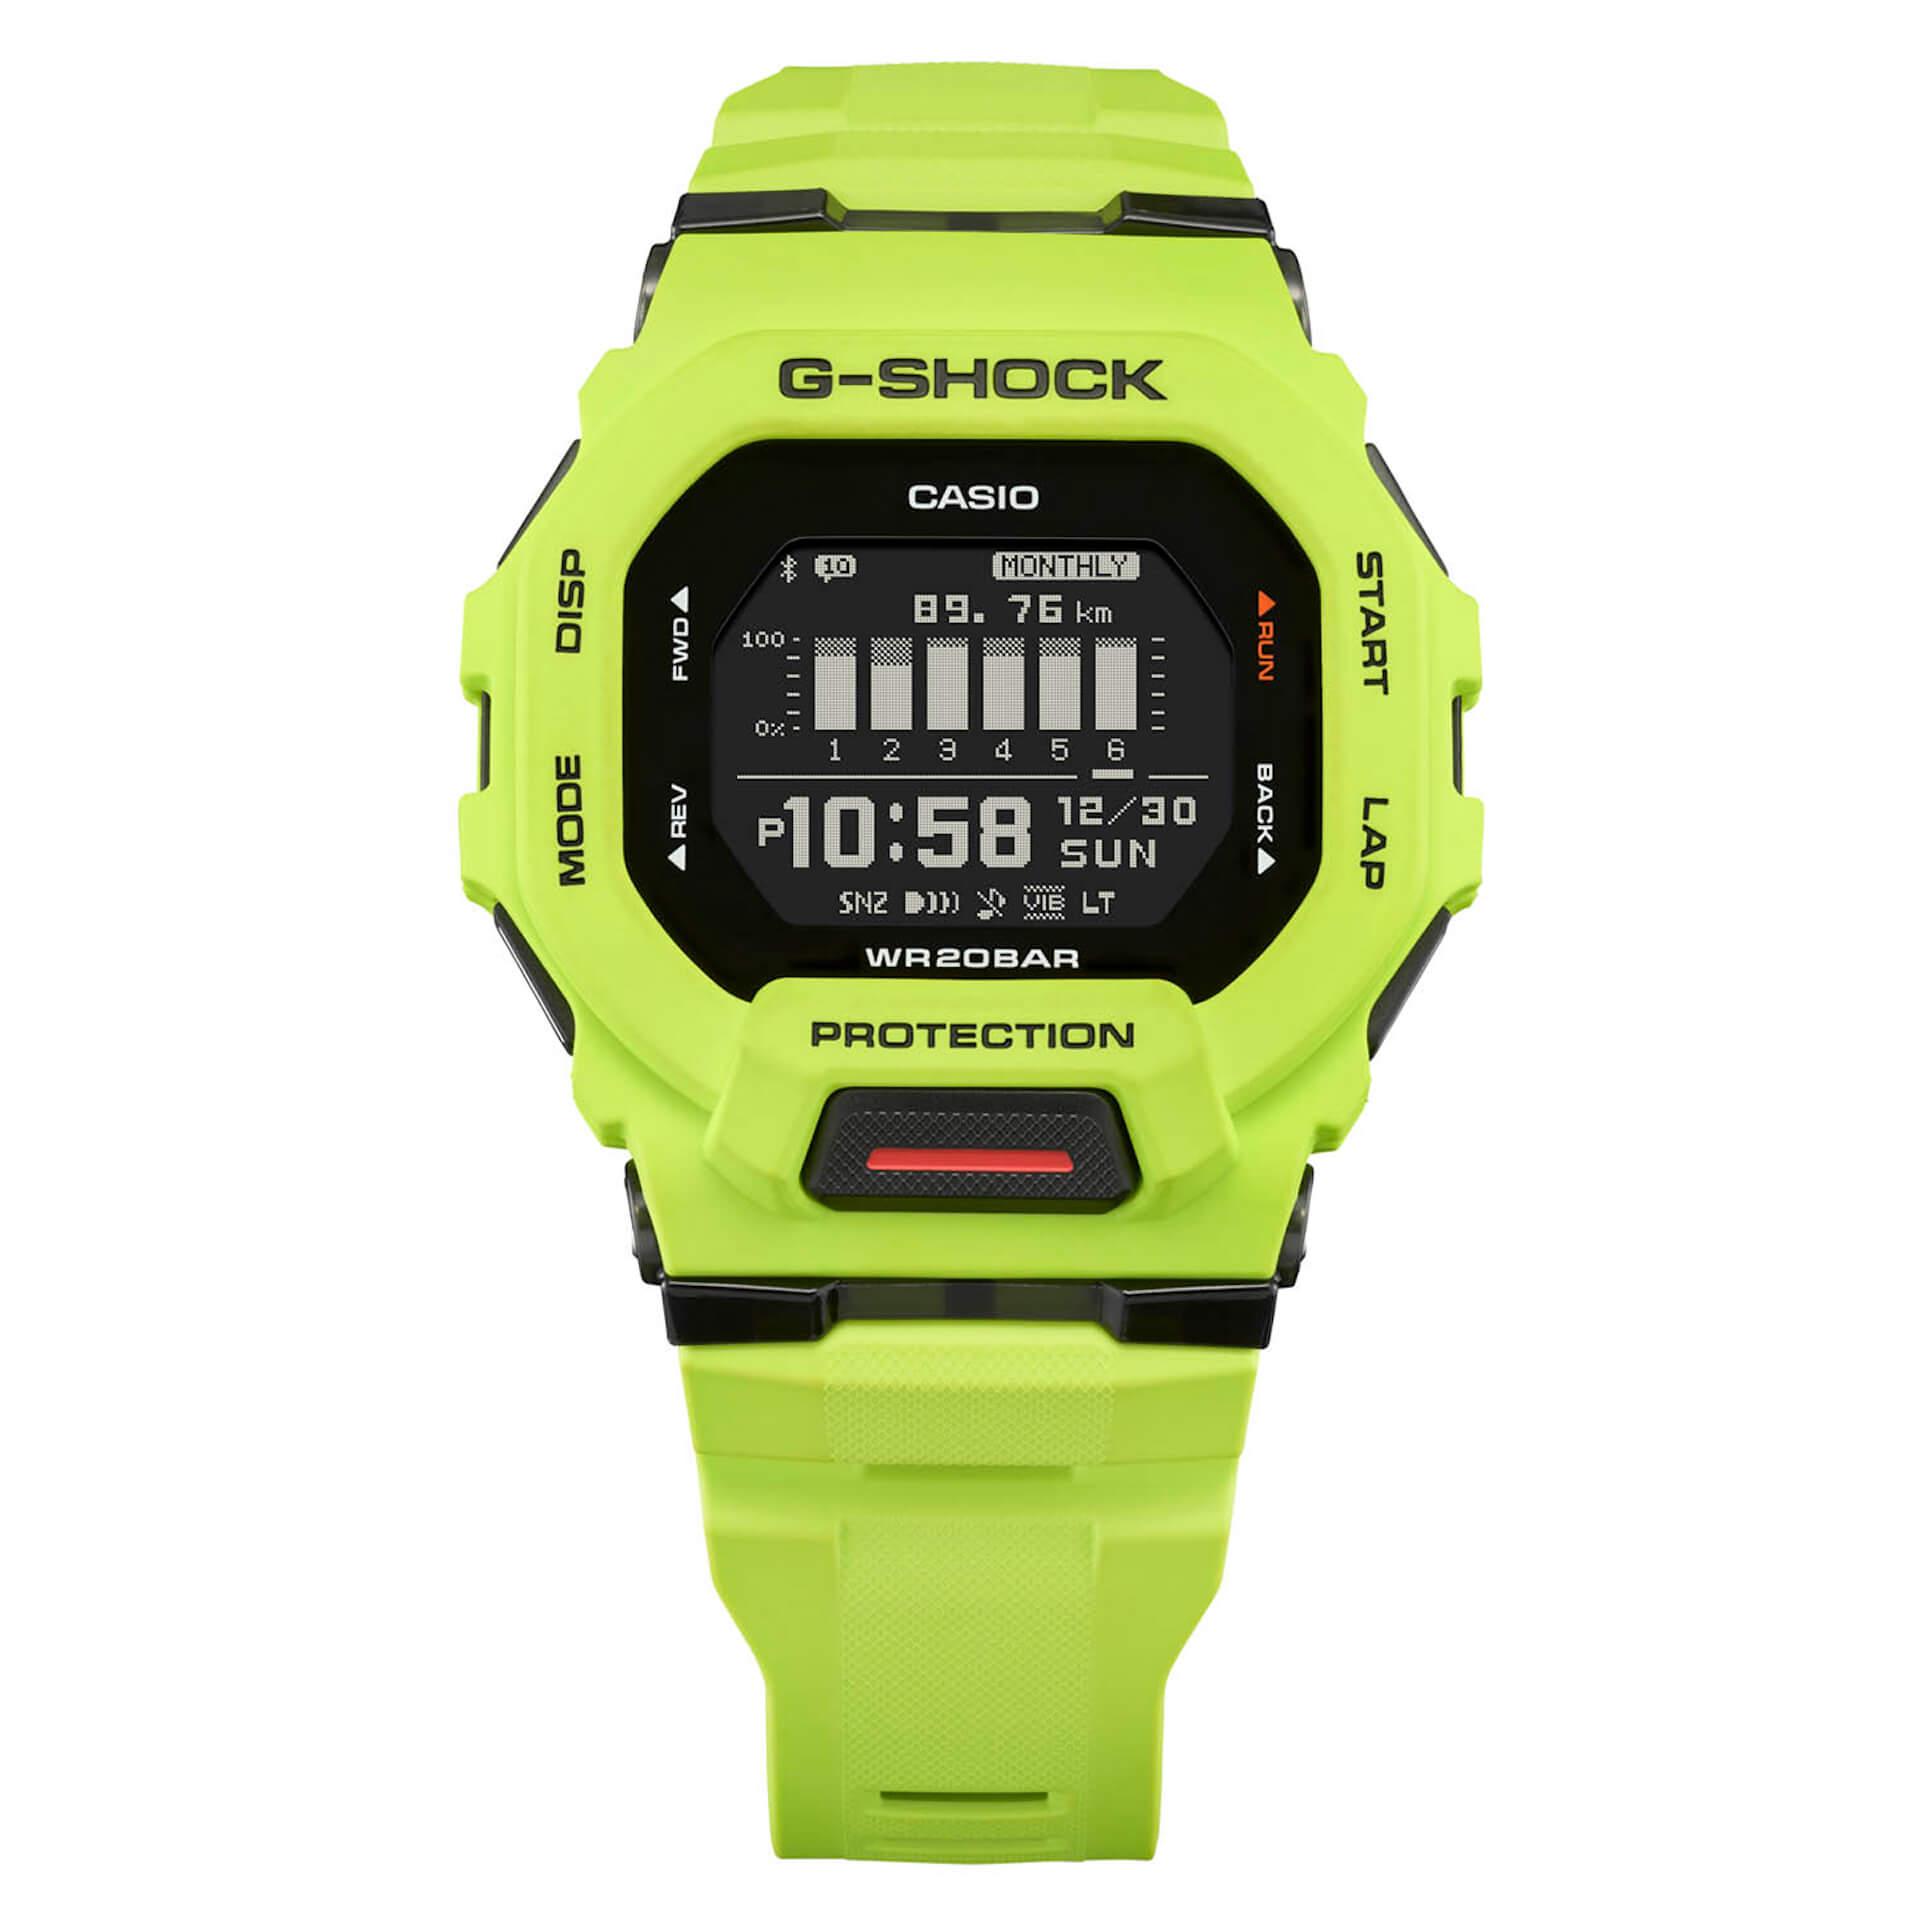 G-SHOCK「G-SQUAD」の角型ケース採用モデルに新製品『GBD-200』が登場! tech210615_gshock_gsquad_2